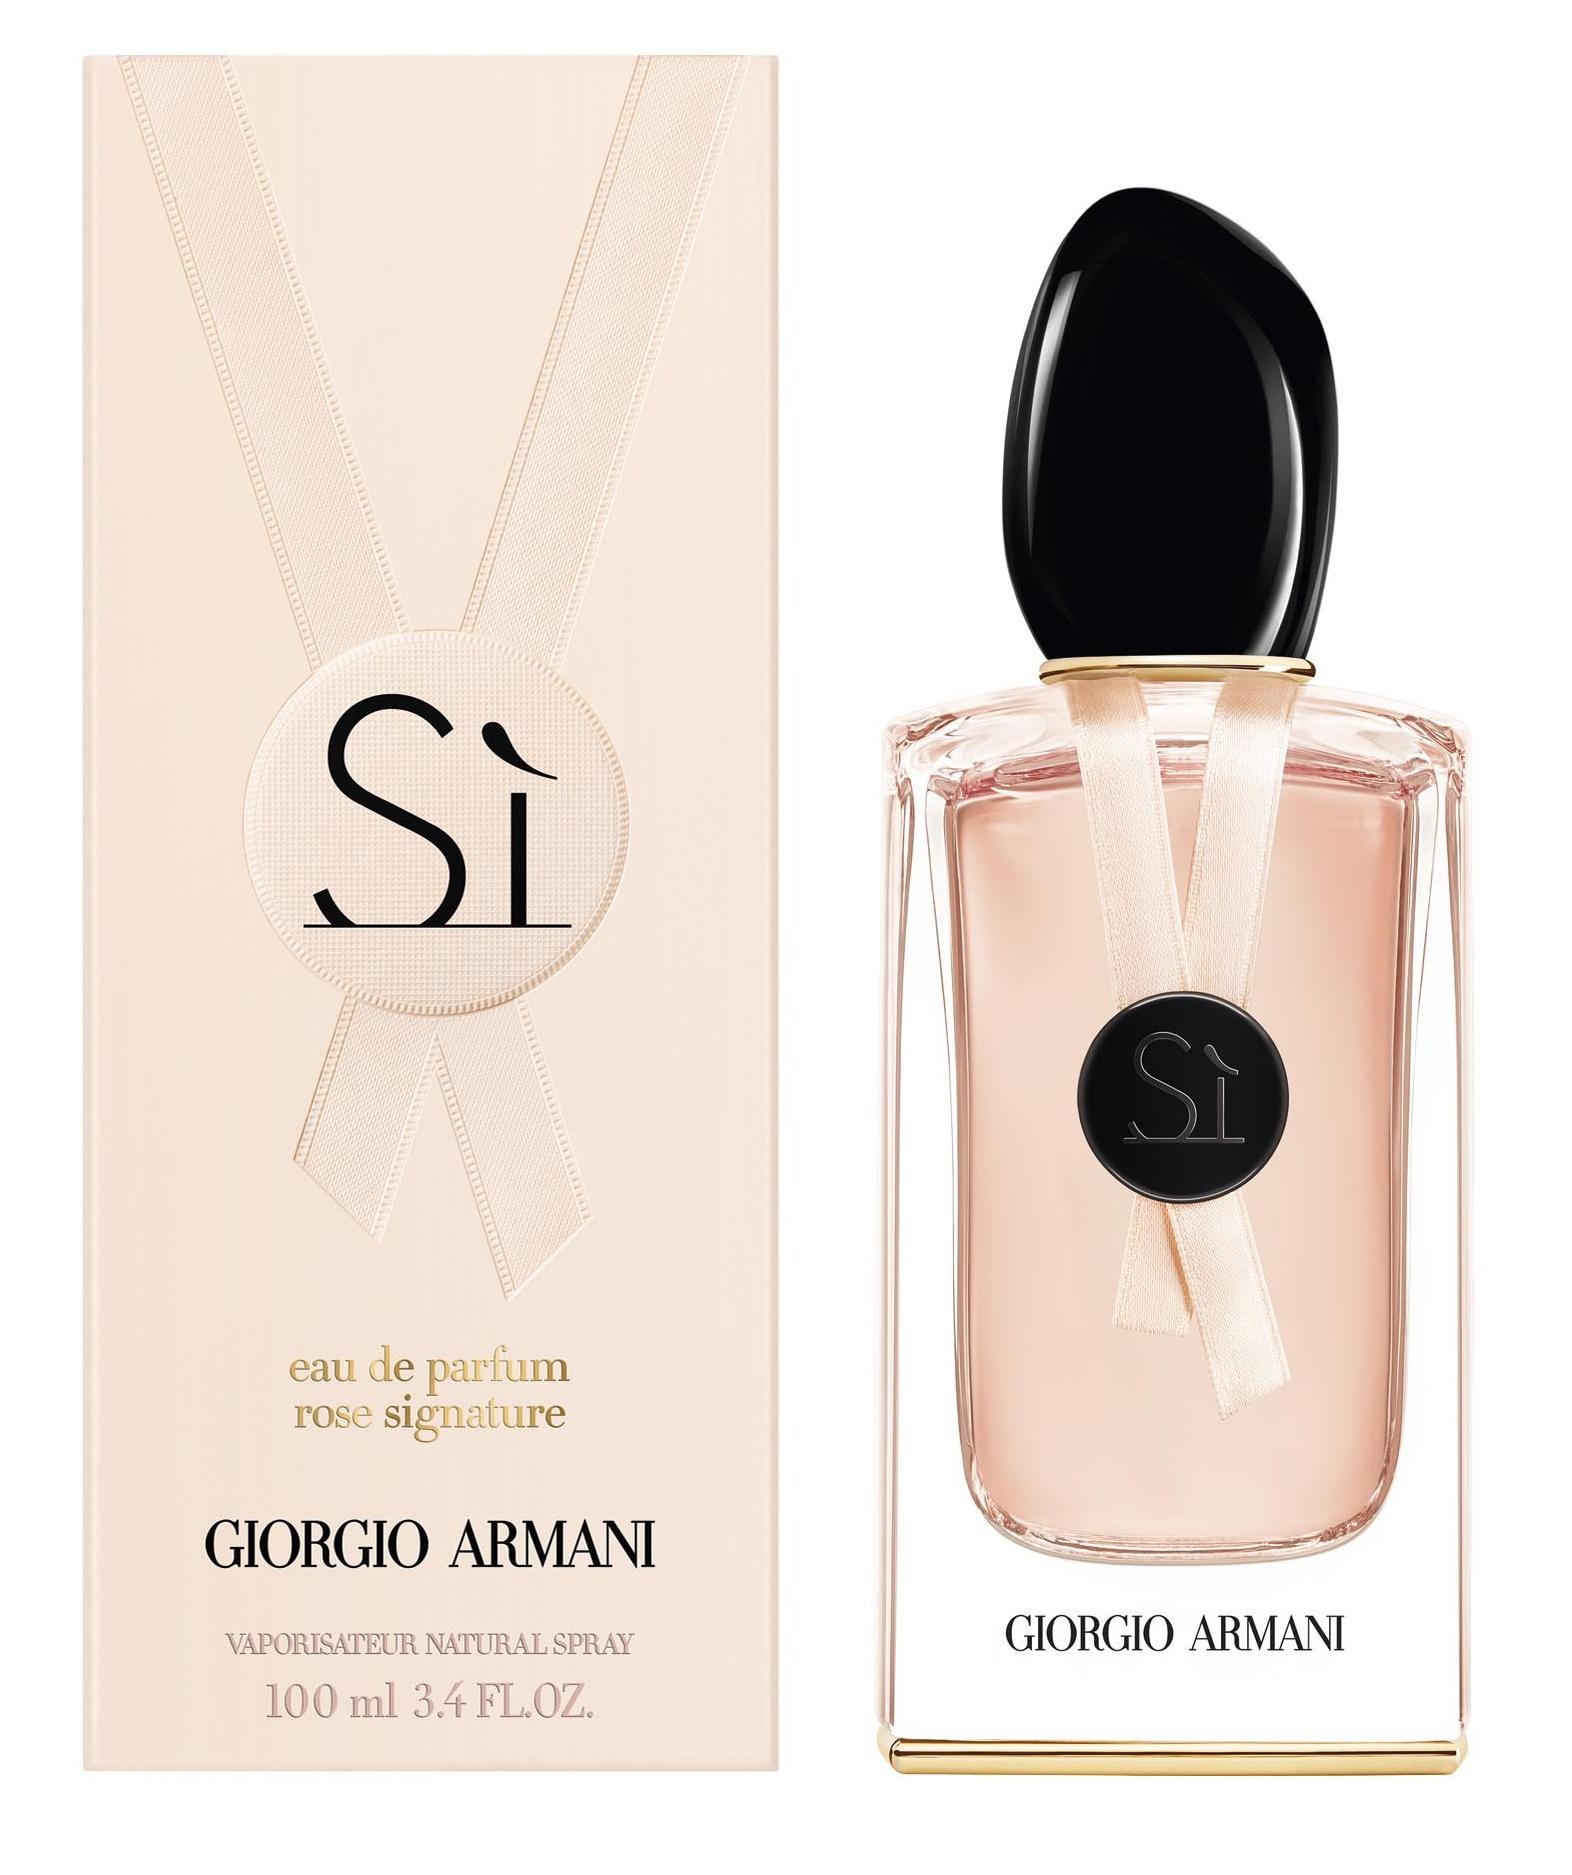 si new perfume